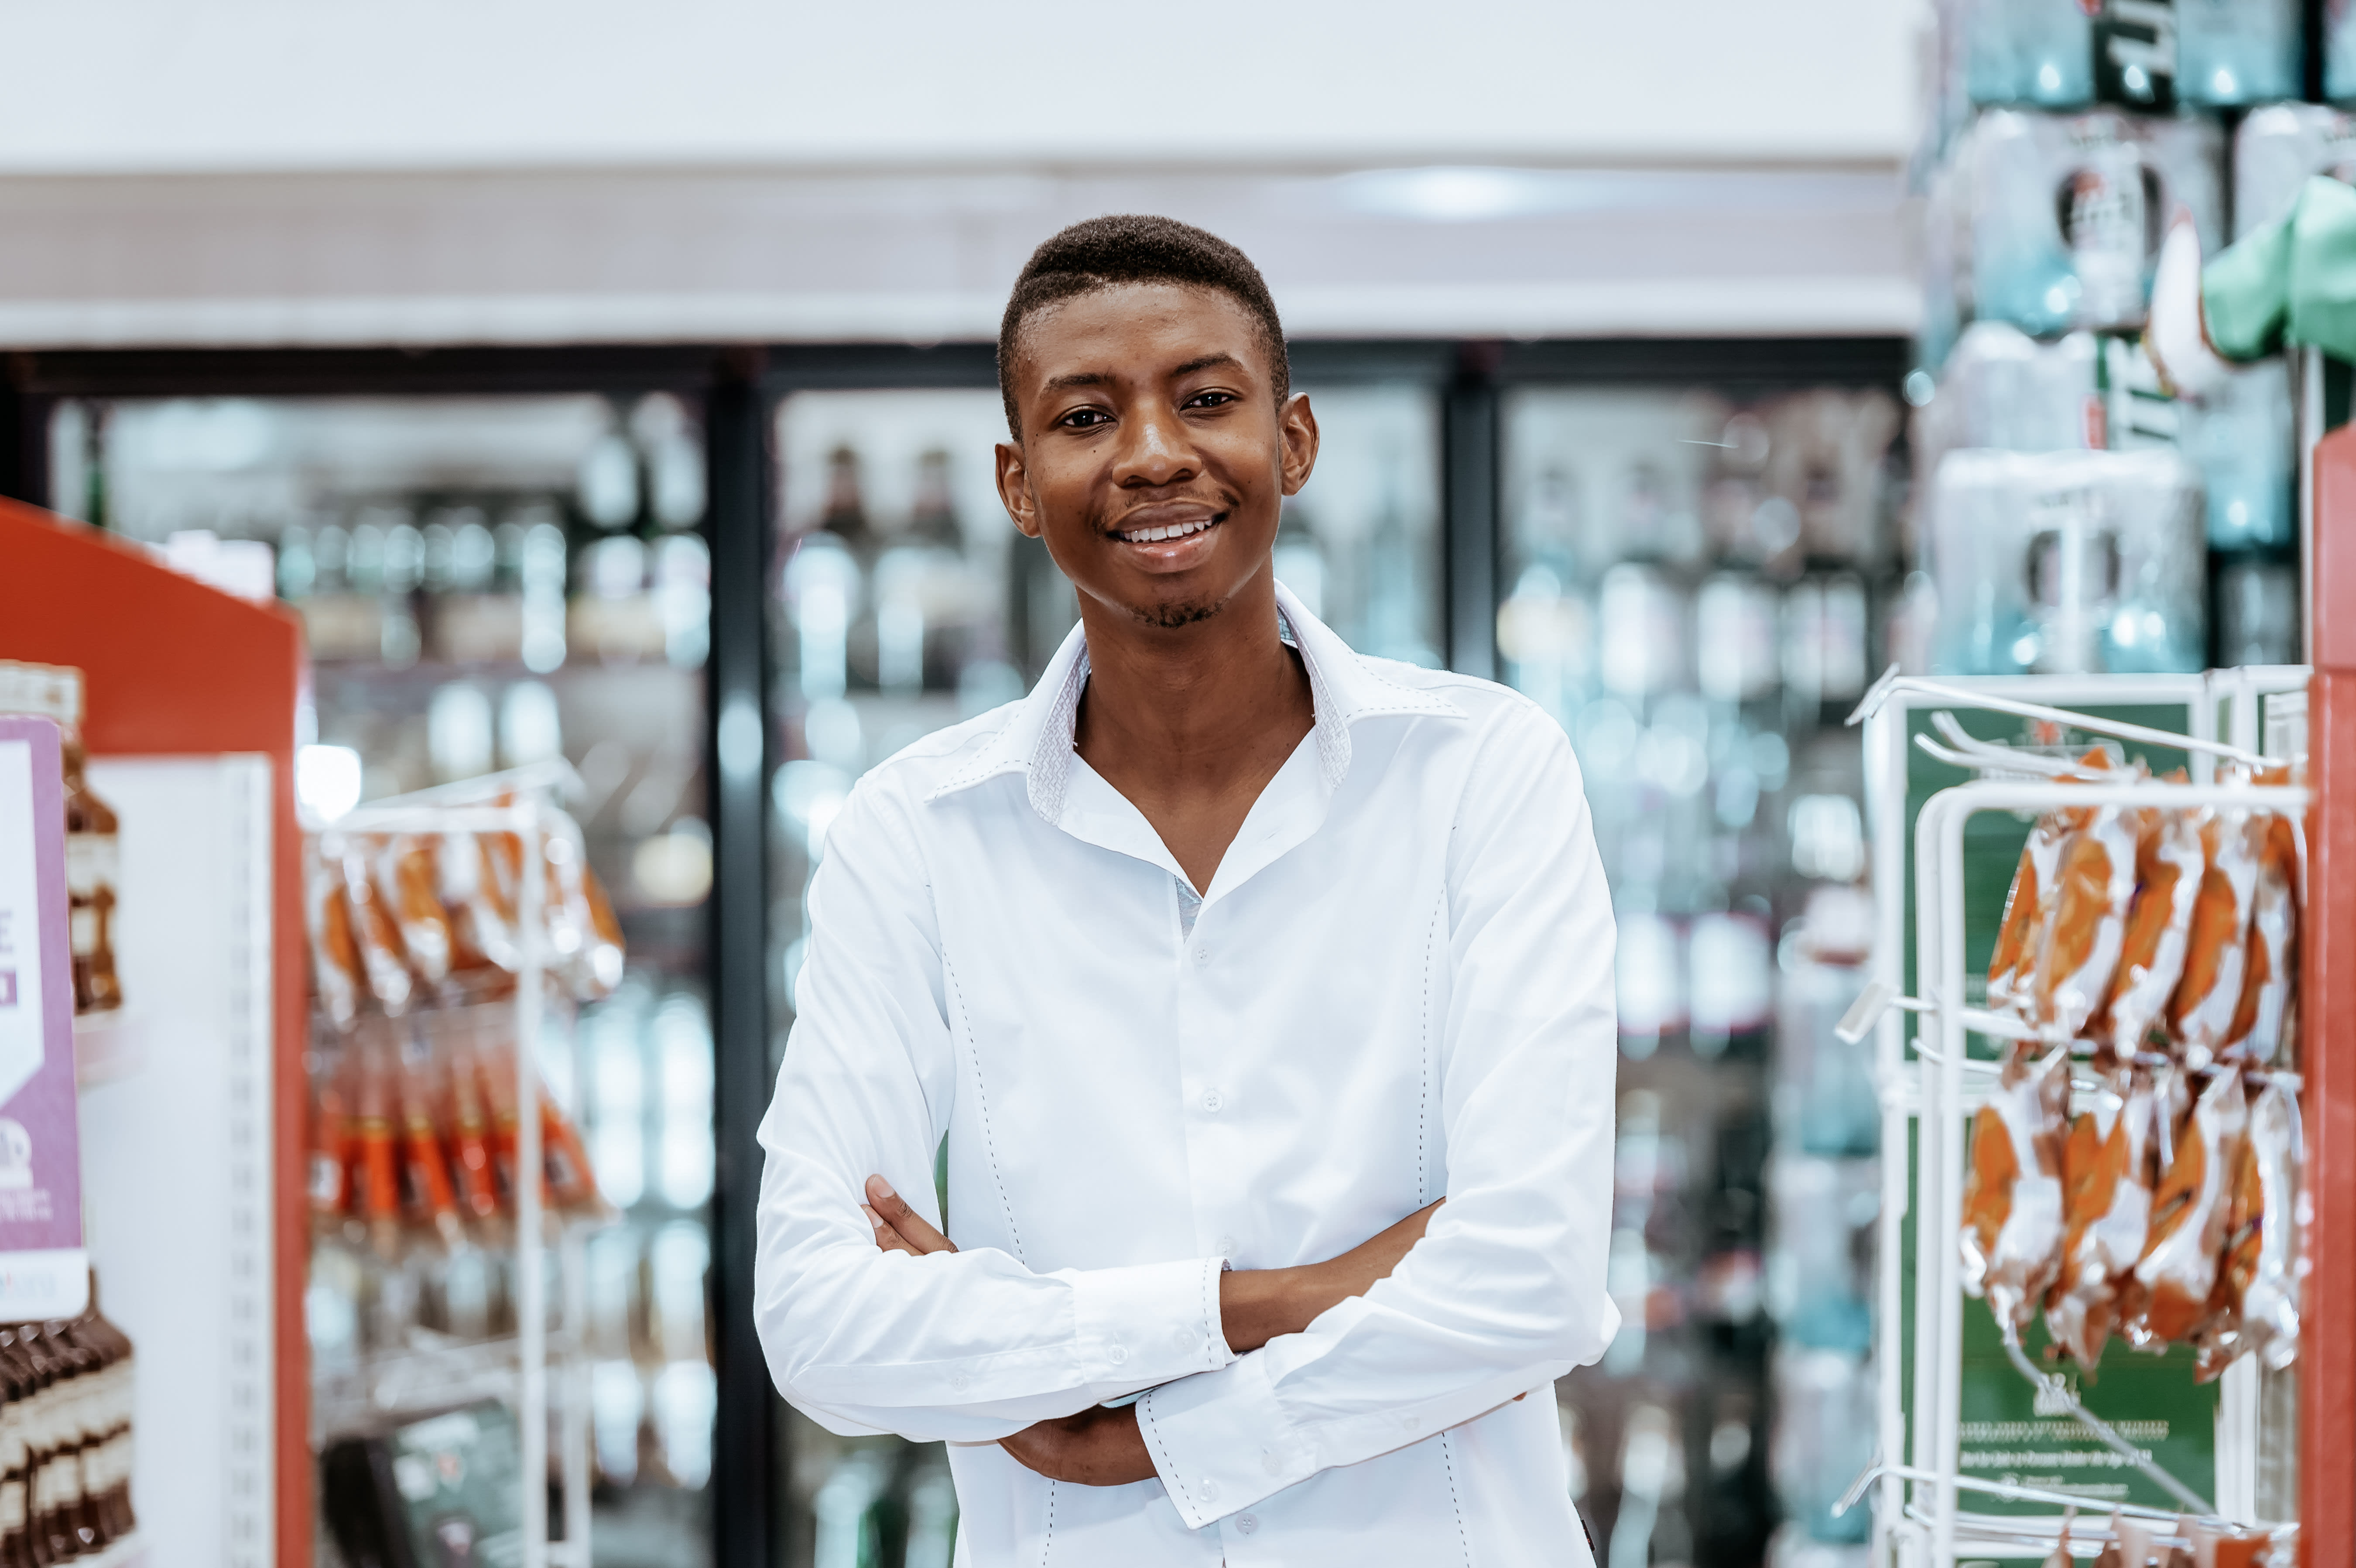 Meet an unusual entrepreneur